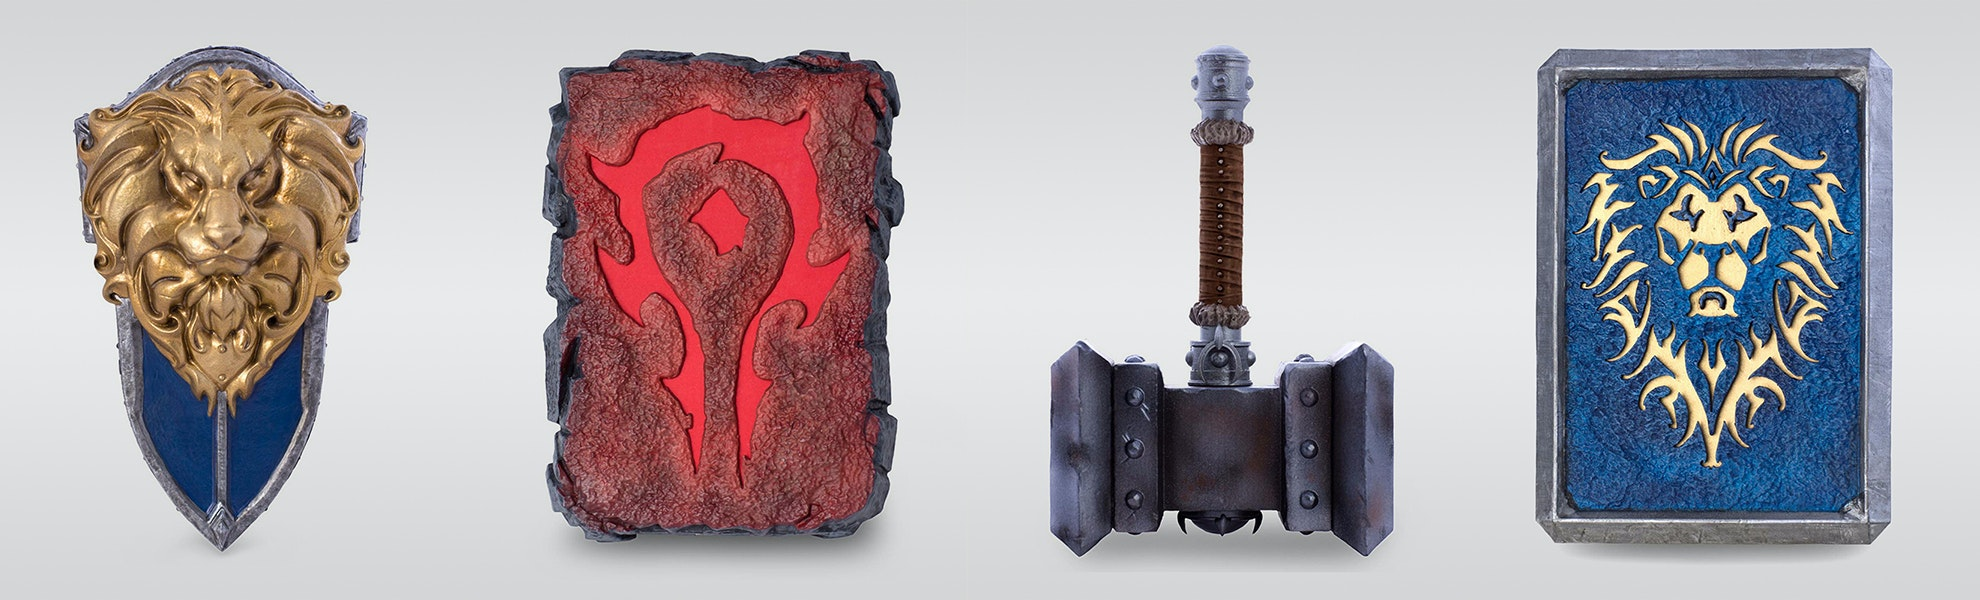 World of Warcraft Power Banks